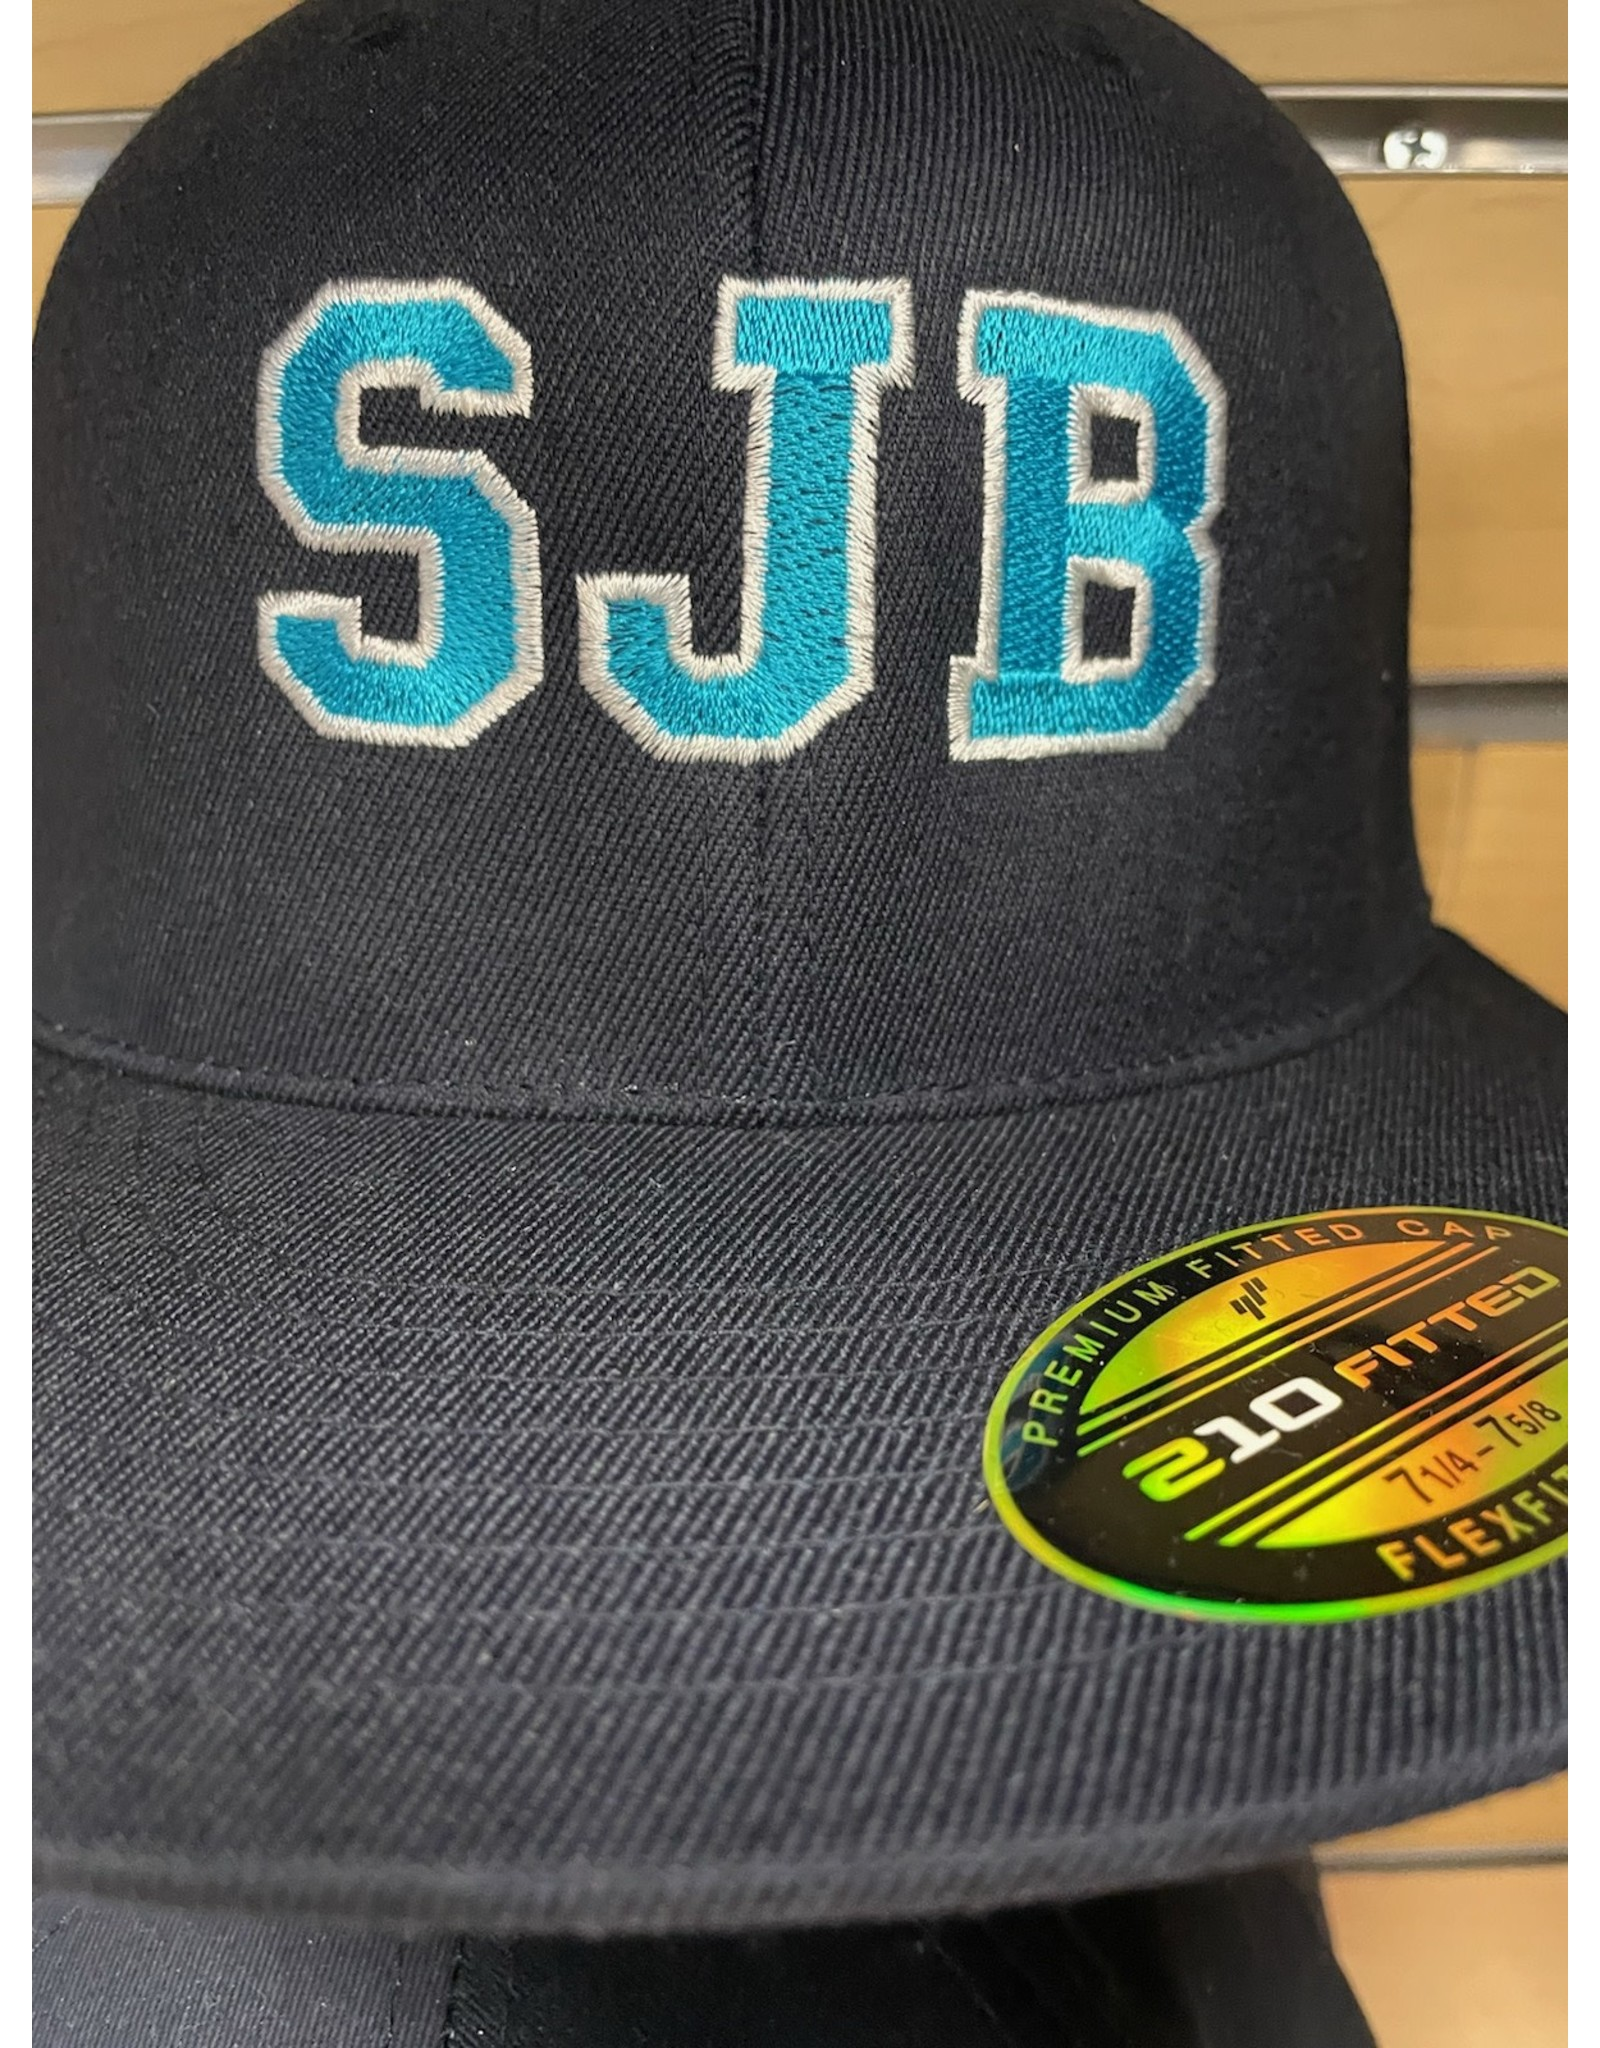 NON-UNIFORM SJB logo hat